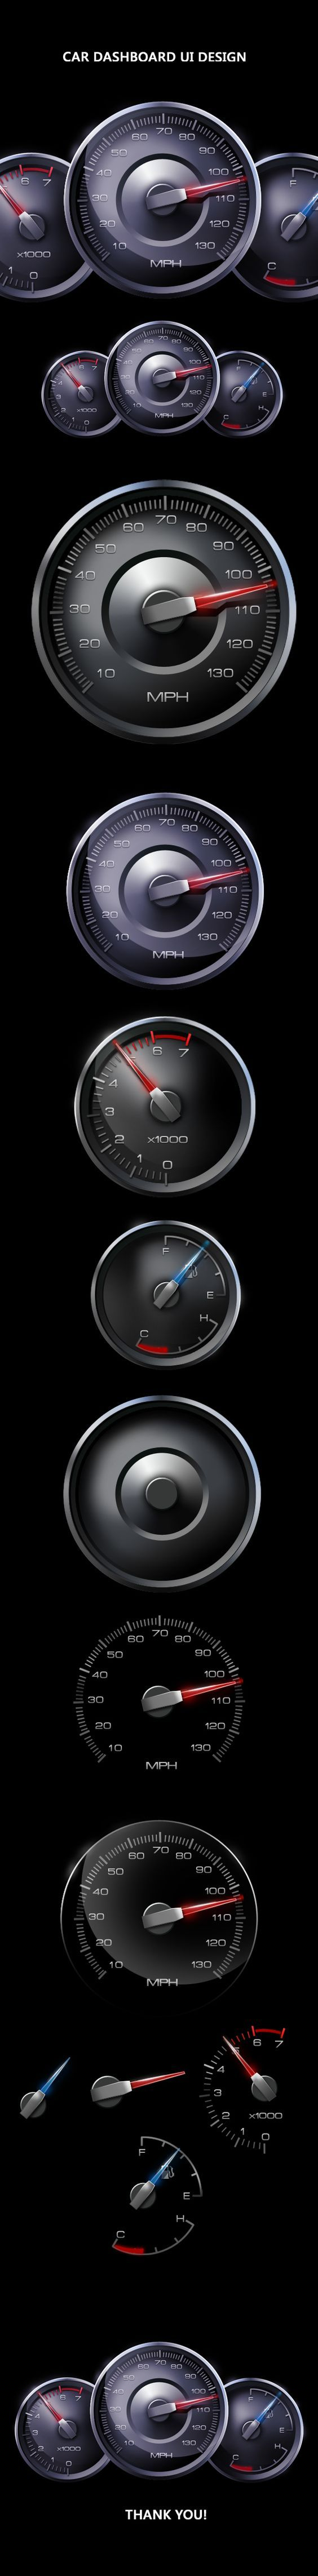 Car Dashboard Ui Design by Mahesh Lonkar, via Behance: